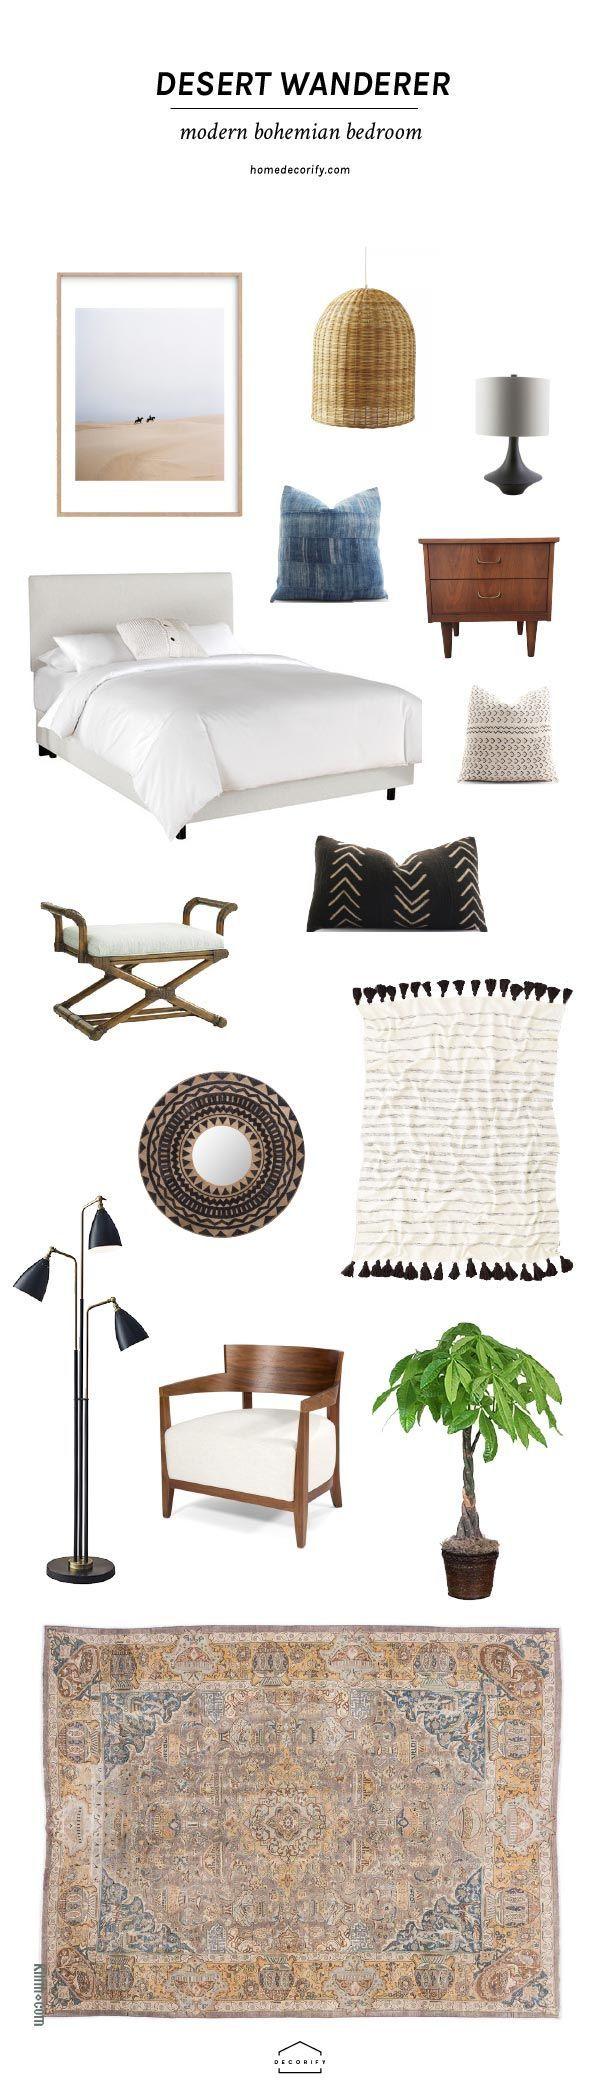 best house ideas images on pinterest chairs scandinavian